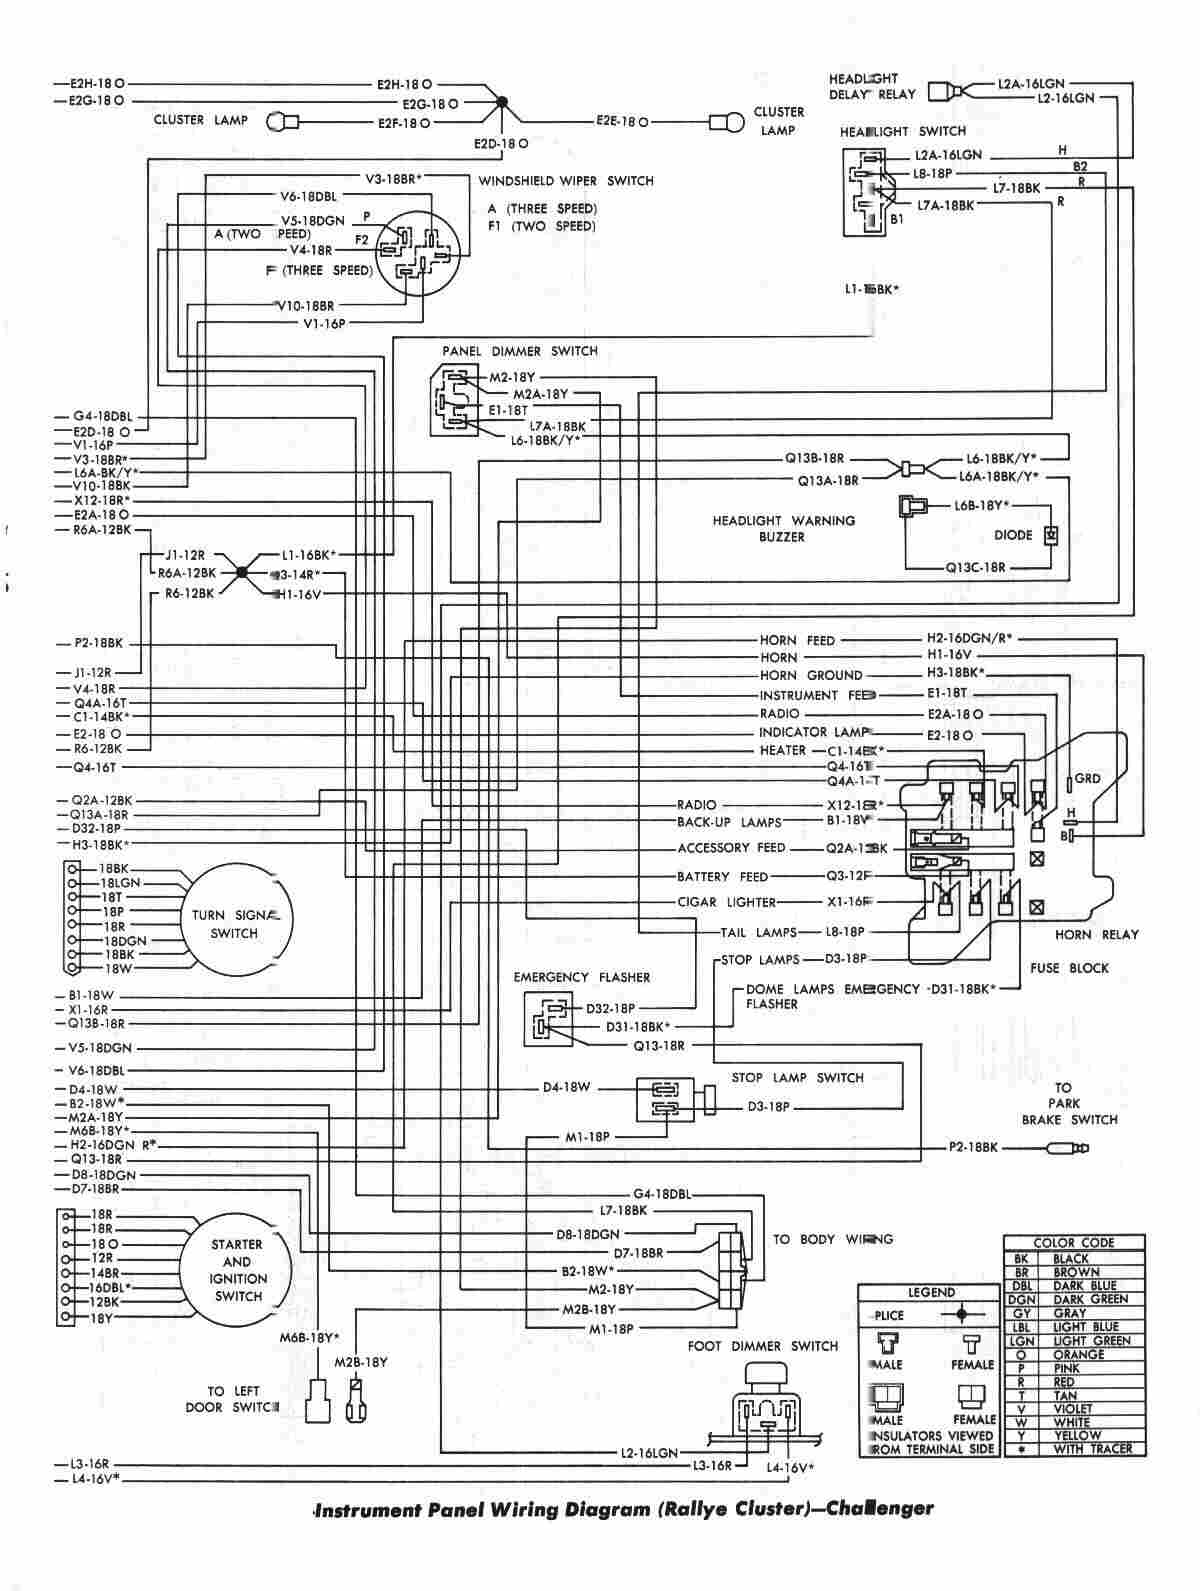 hight resolution of wiring diagram 2012 dodge challenger wiring free engine 2010 dodge challenger radio wiring diagram 2010 dodge challenger radio wiring diagram